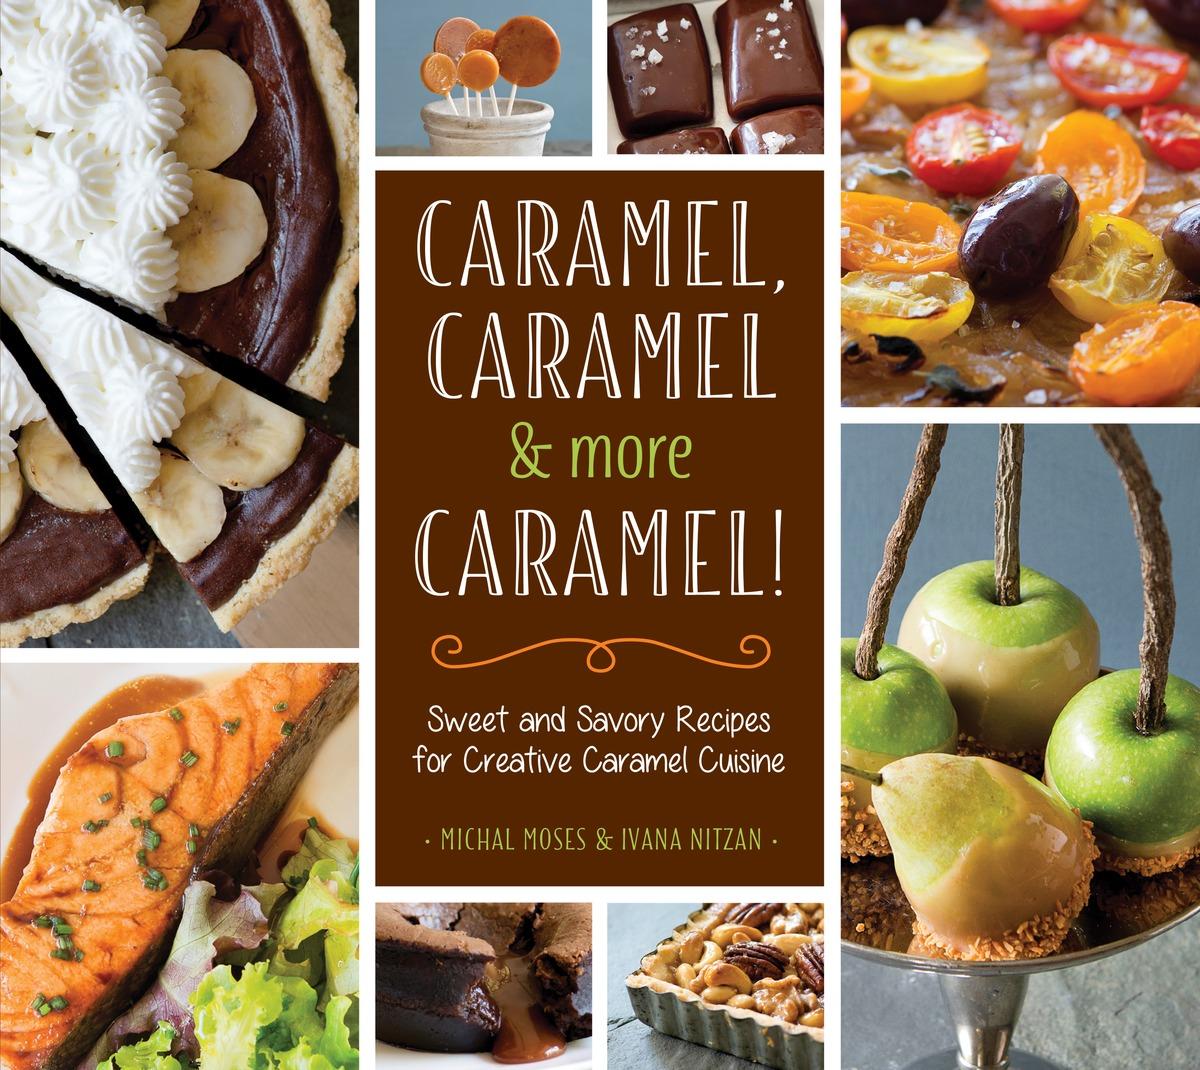 Caramel, Caramel & More Caramel! luxlite caramel